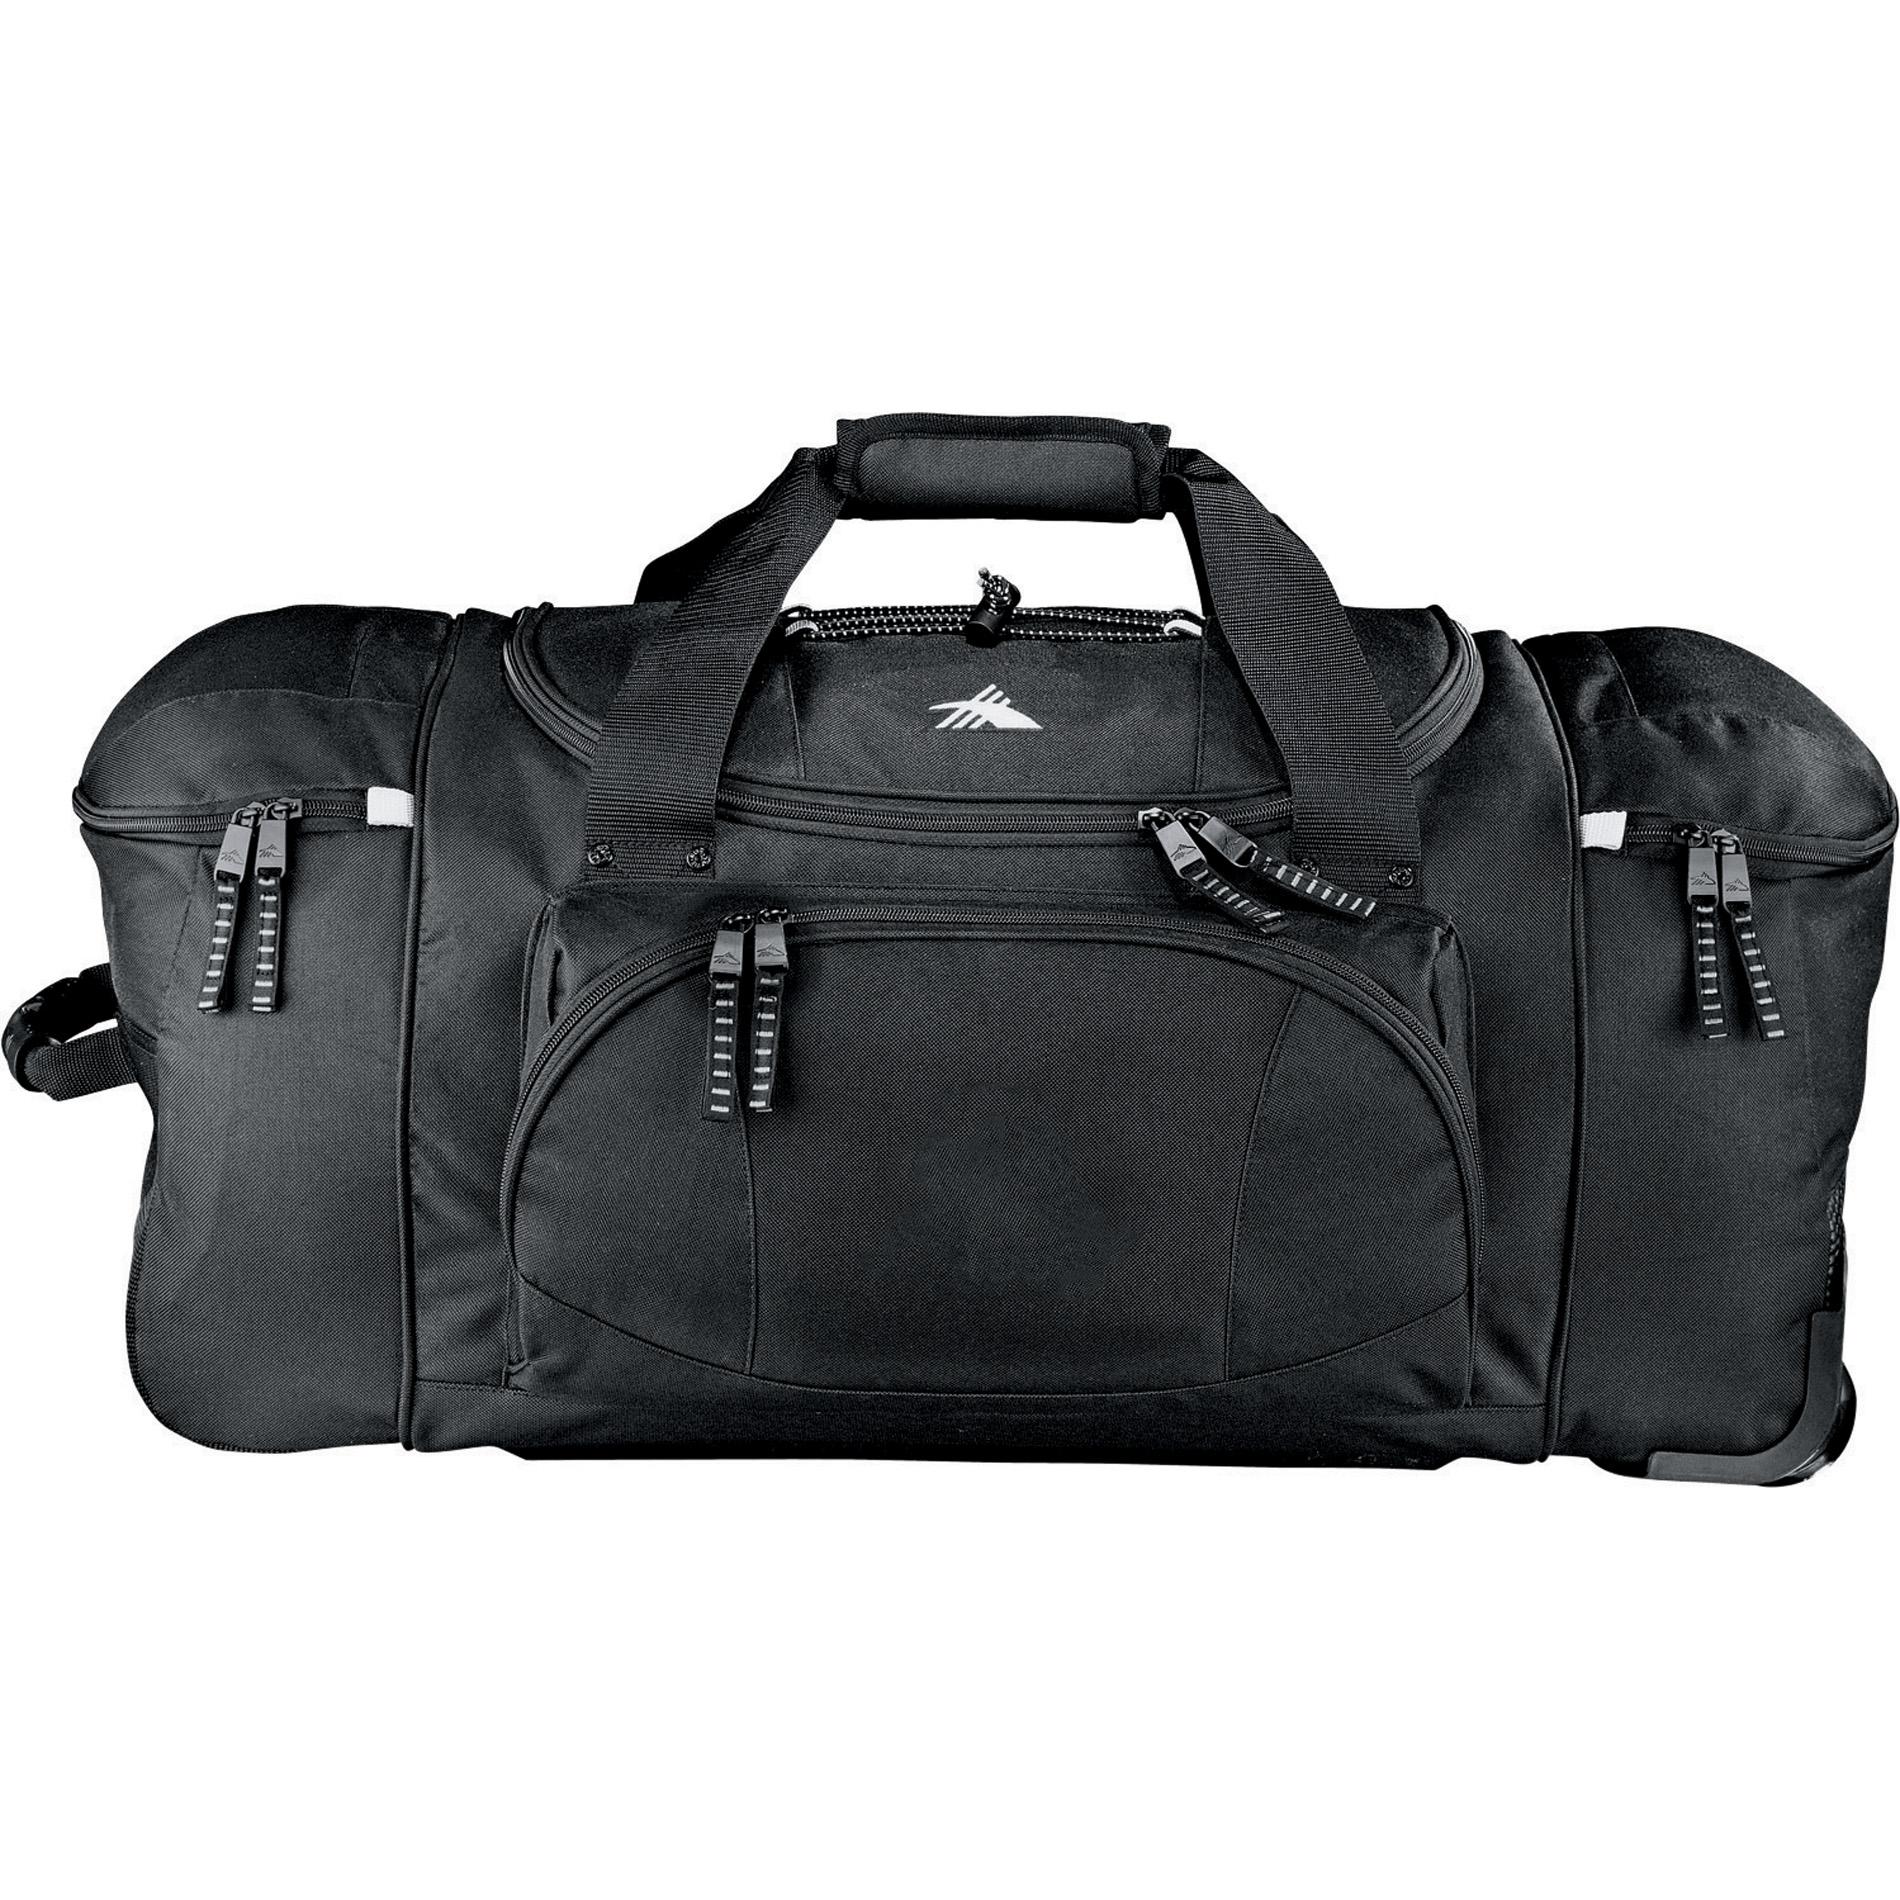 "High Sierra? 26"" Wheeled Duffel Bag"